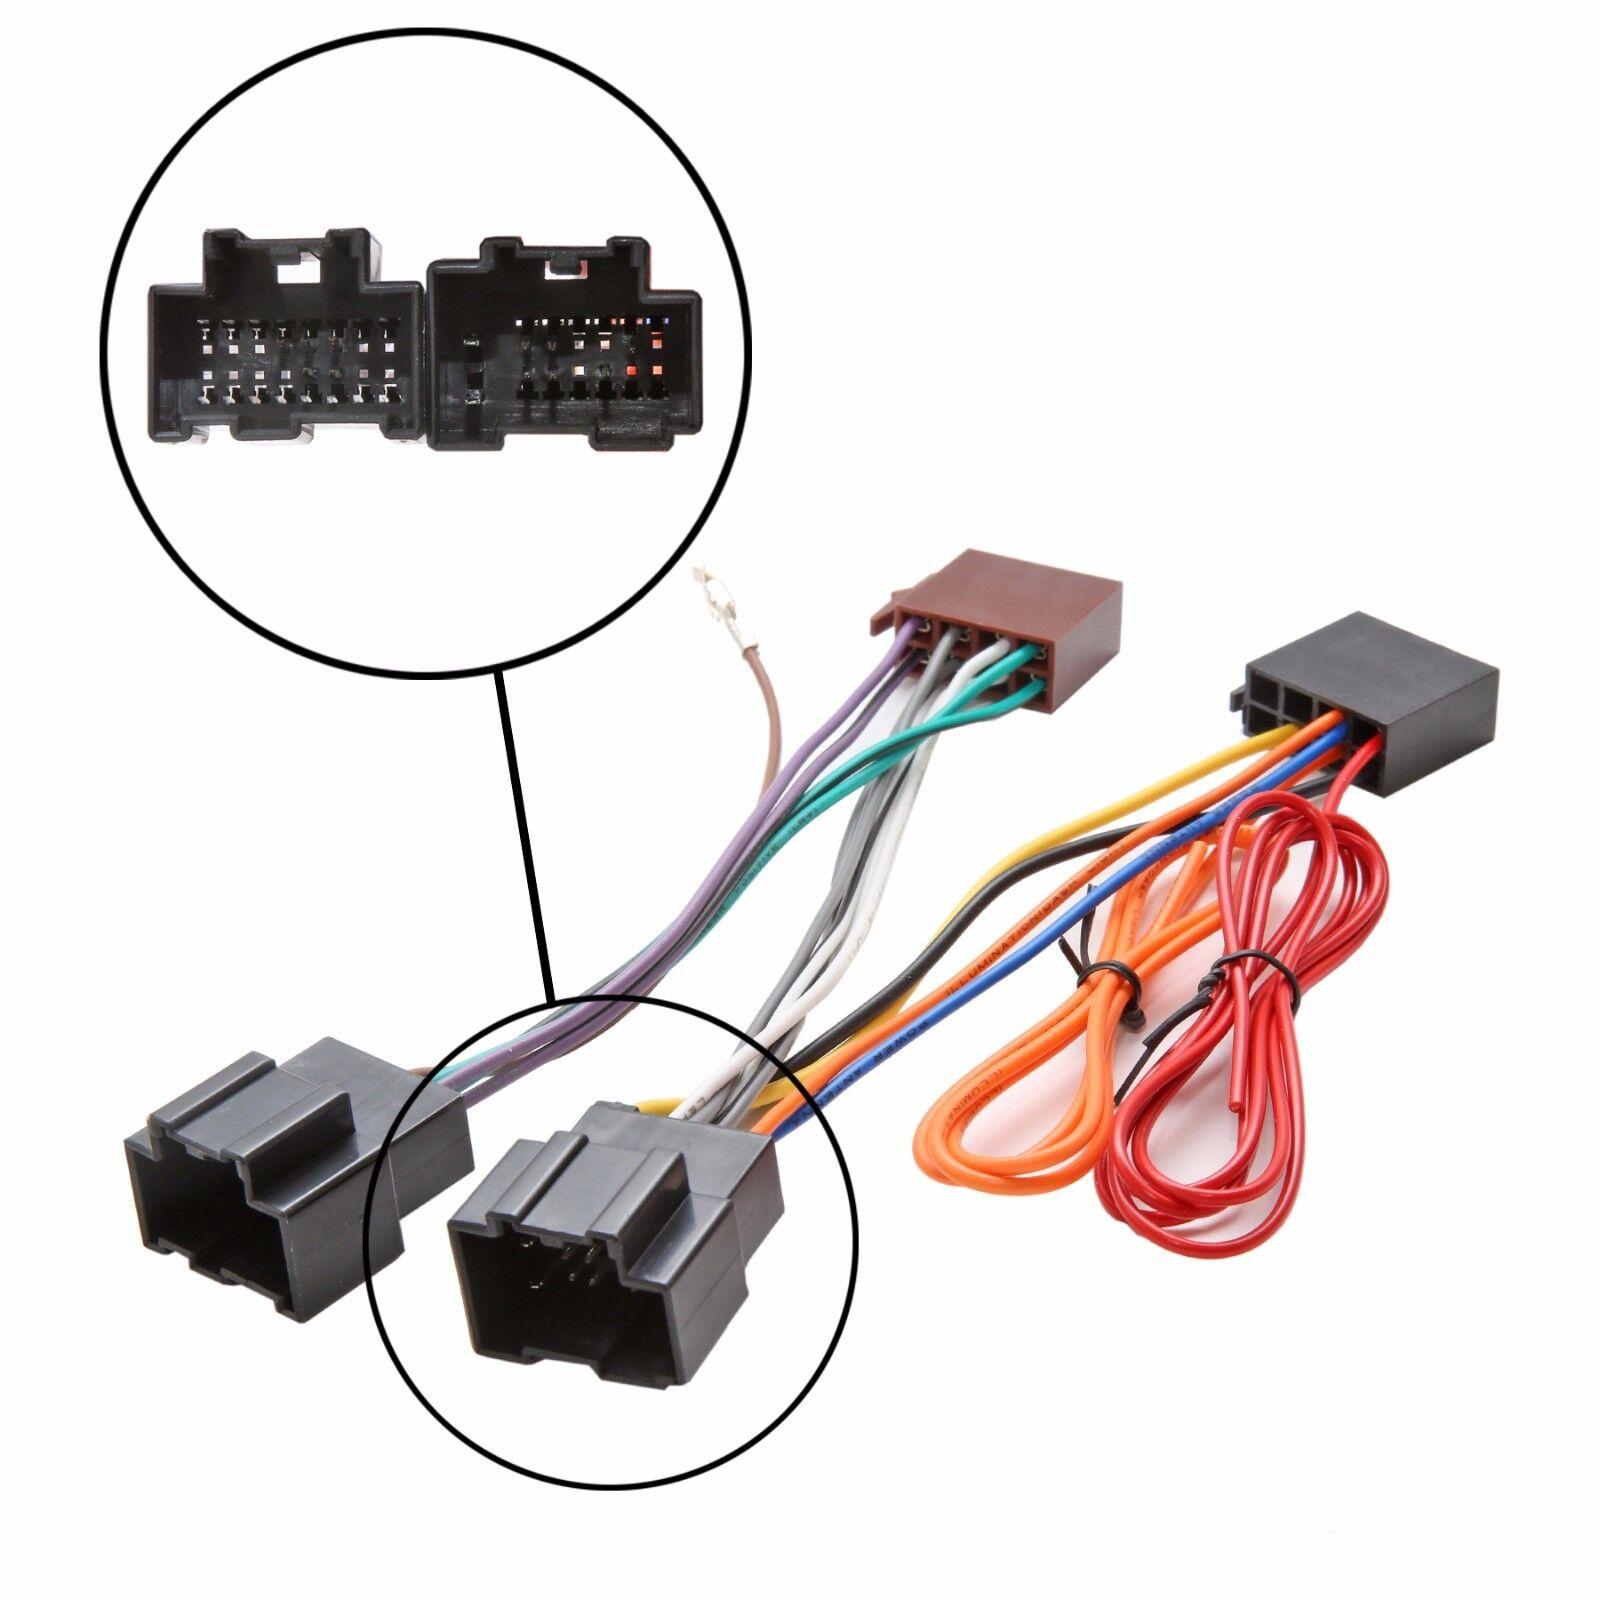 saab wiring harness 4 1 ulrich temme de \u2022car stereo radio iso wiring harness connector adaptor loom cable for rh ebay com saab radio wiring harness saab 9 3 wiring harness